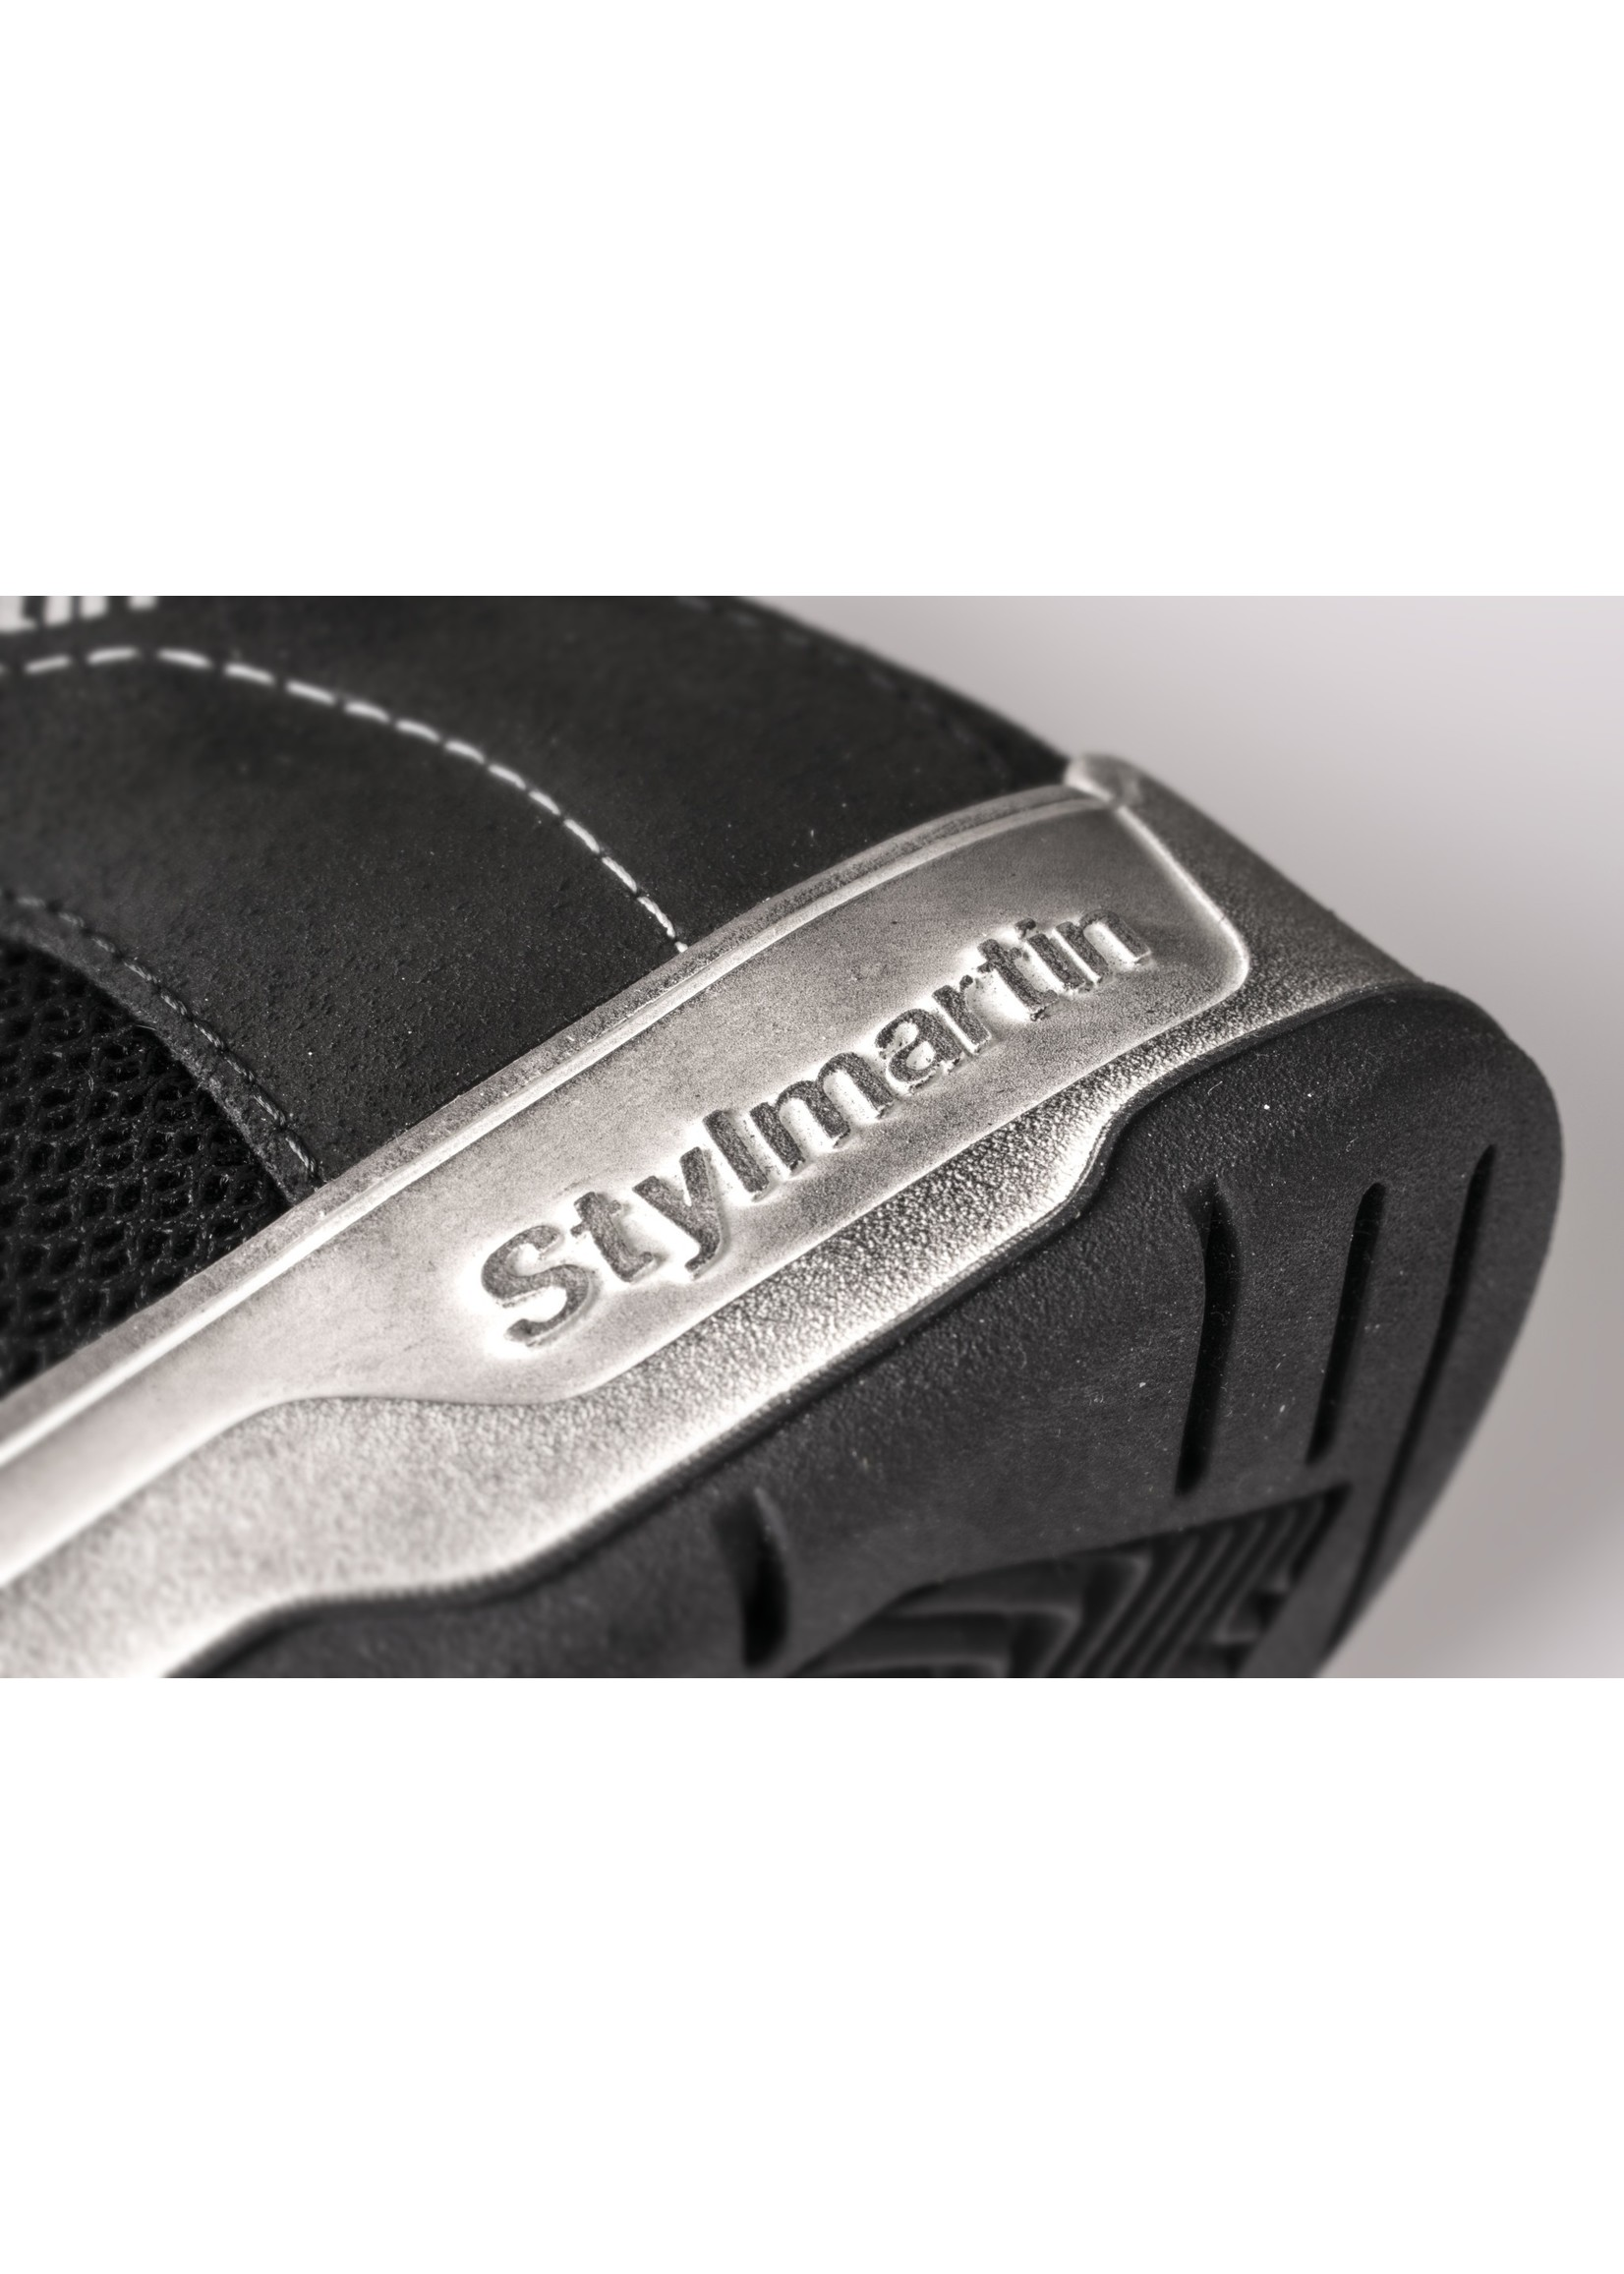 Stylmartin Stylmartin Atom Schoenen